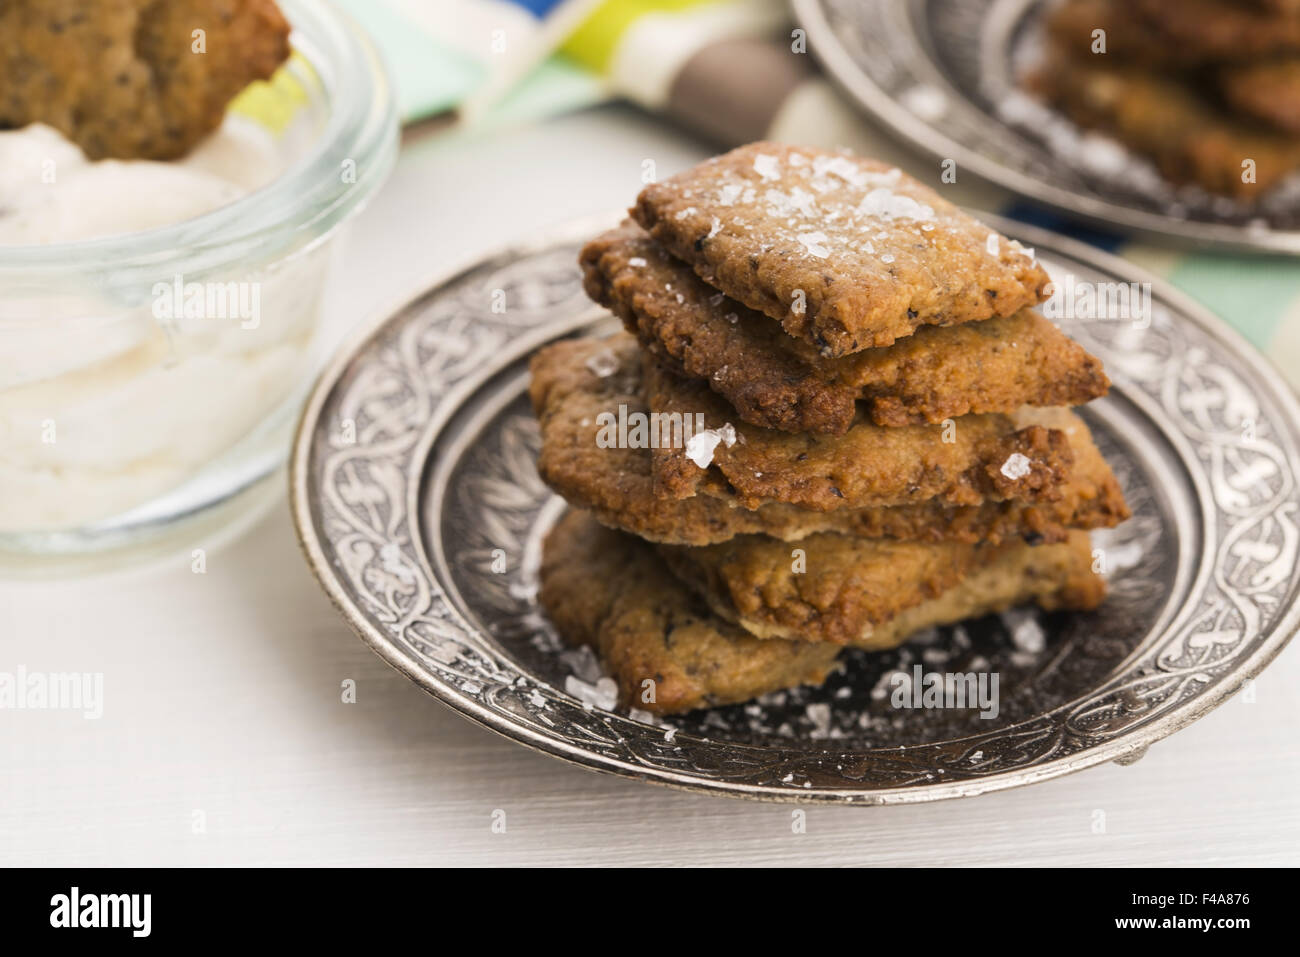 spanish snack crackers stock photos spanish snack crackers stock